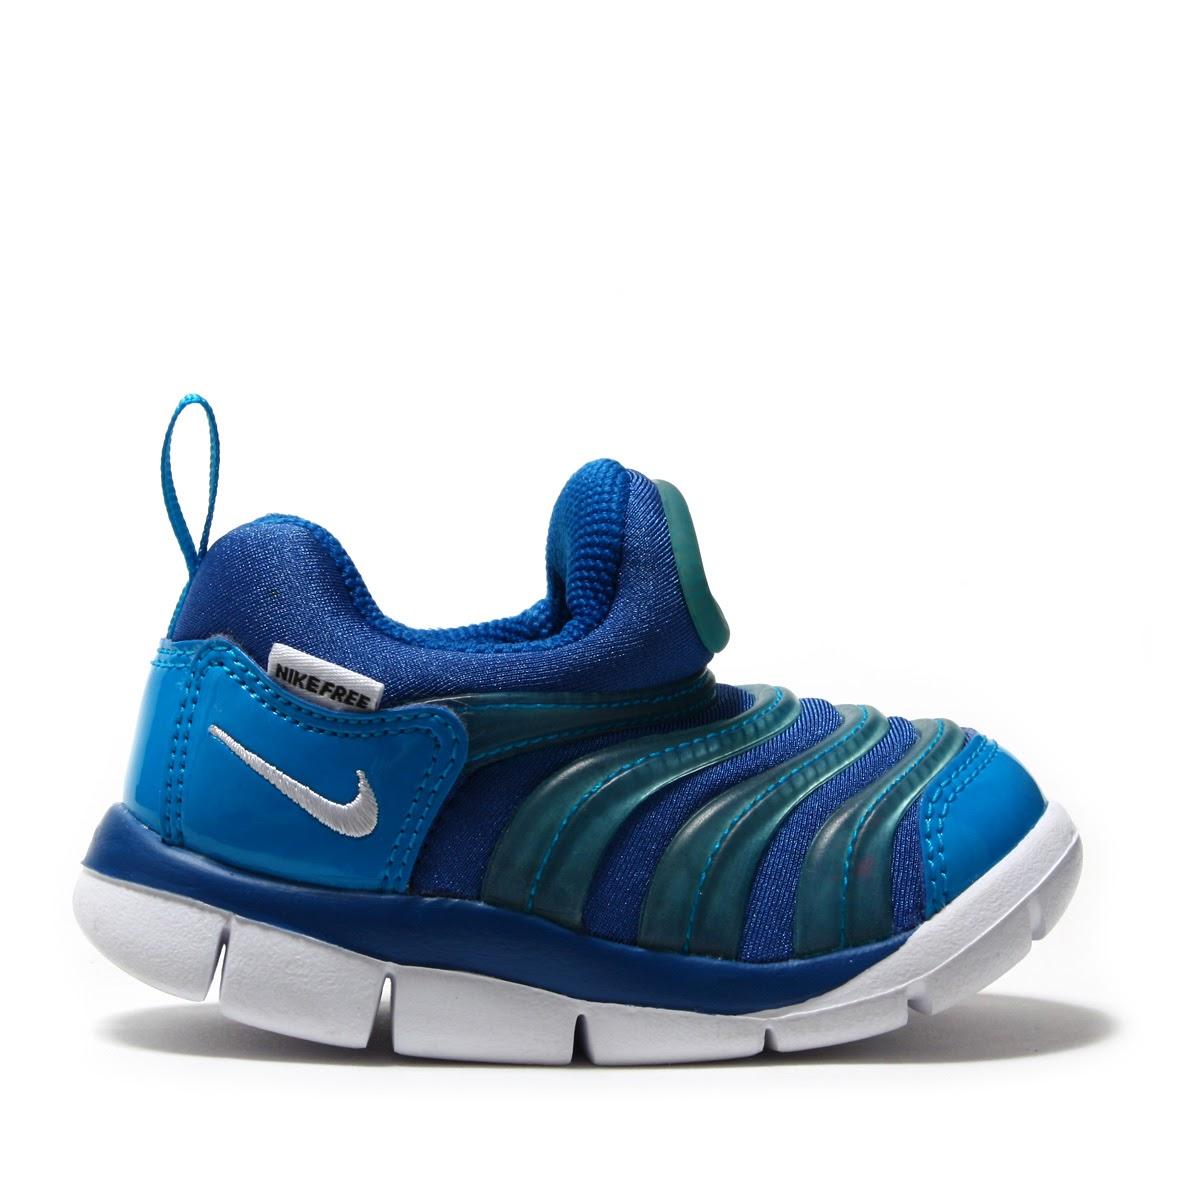 899a47bda8e9 NIKE DYNAMO FREE (TD) (BLUE JAY WHITE-BLUE ORBIT) (Nike dynamo-free TD)